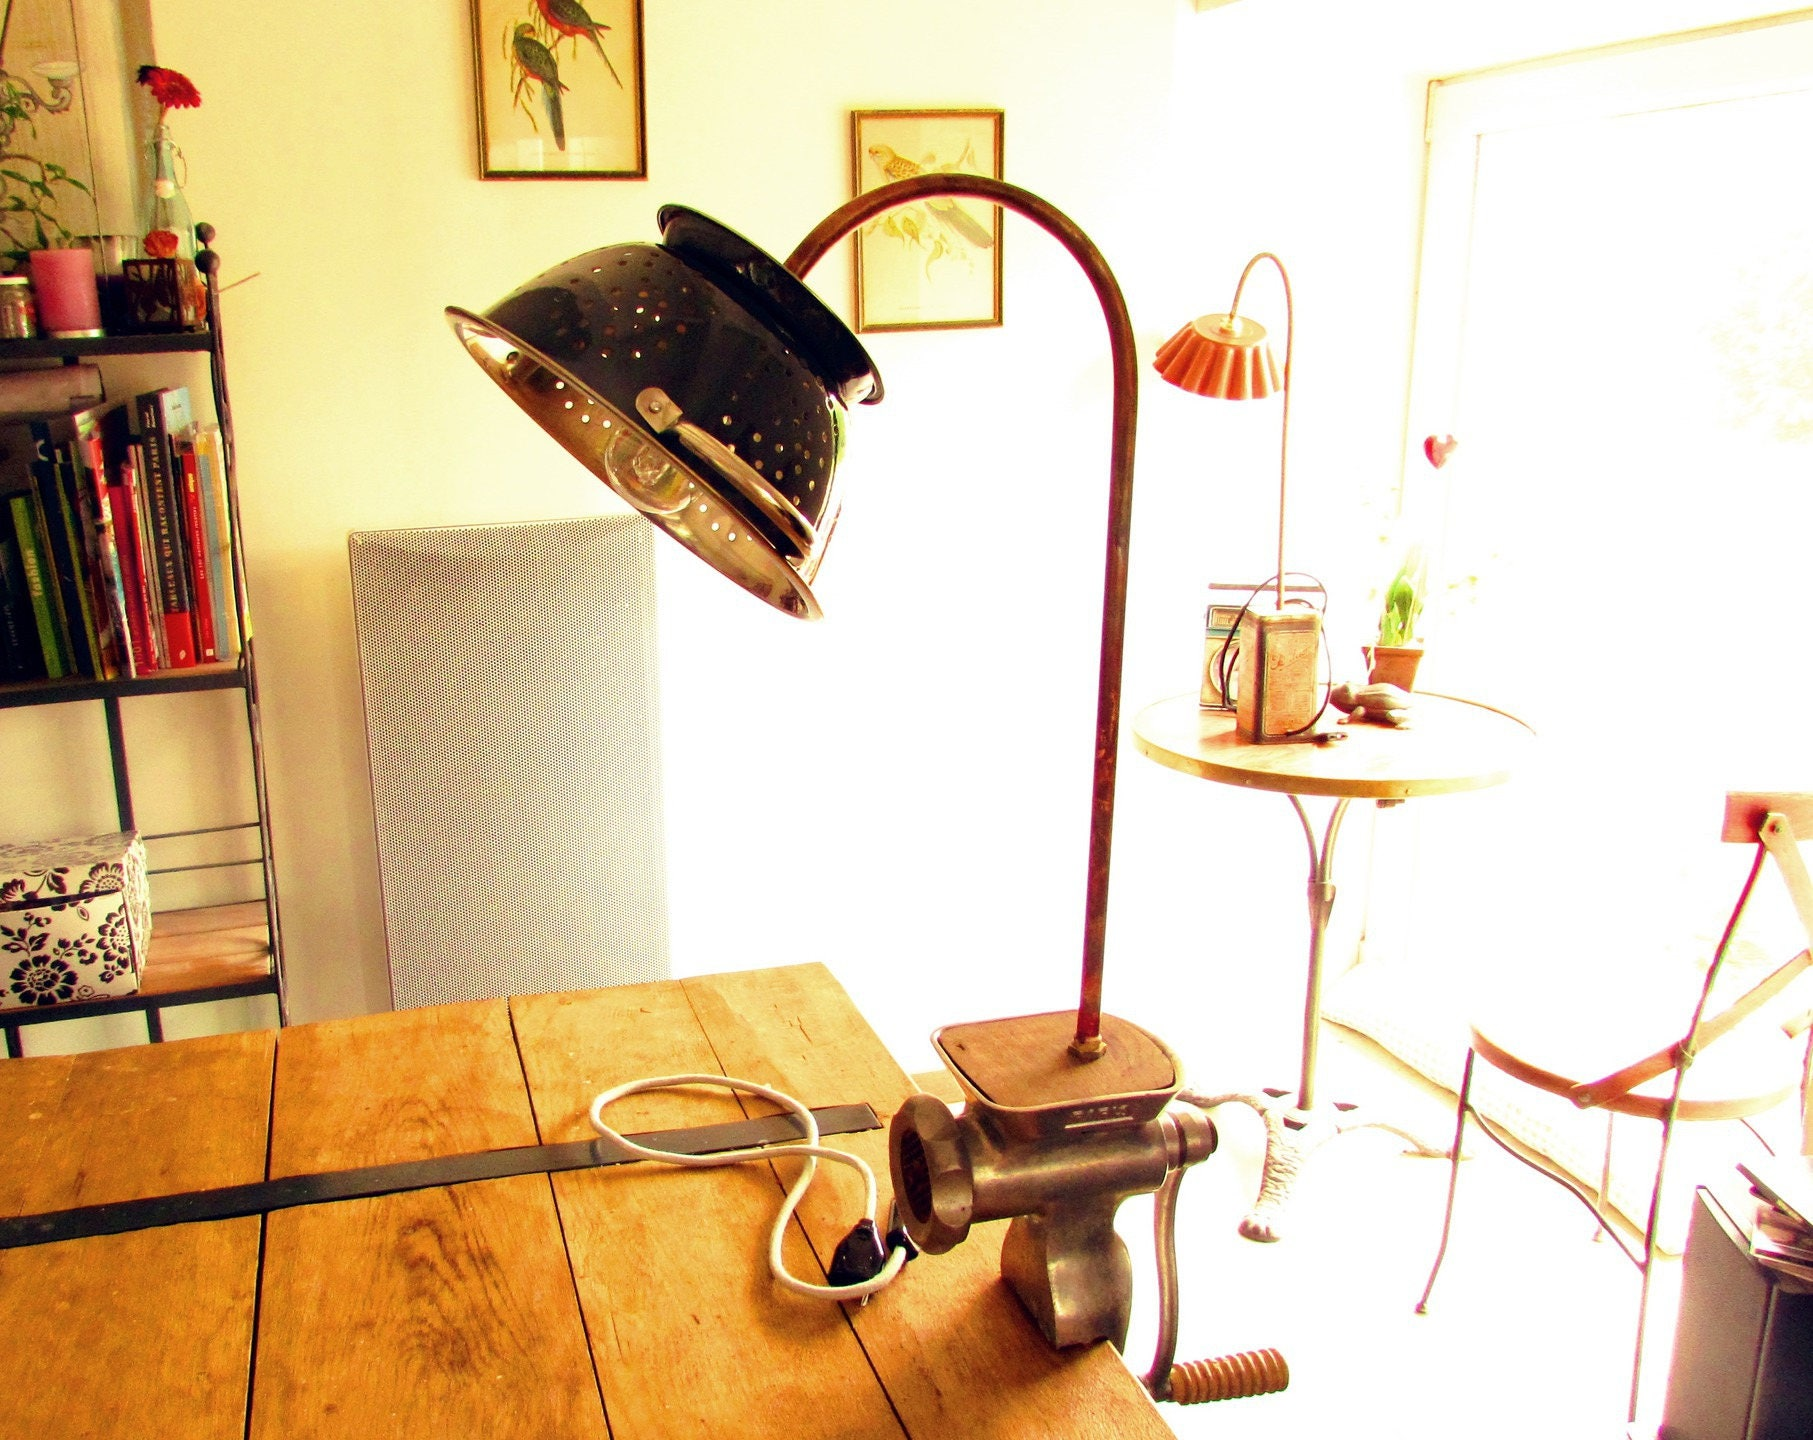 lampe vintage poser fixer avec accroche serre joint objet. Black Bedroom Furniture Sets. Home Design Ideas